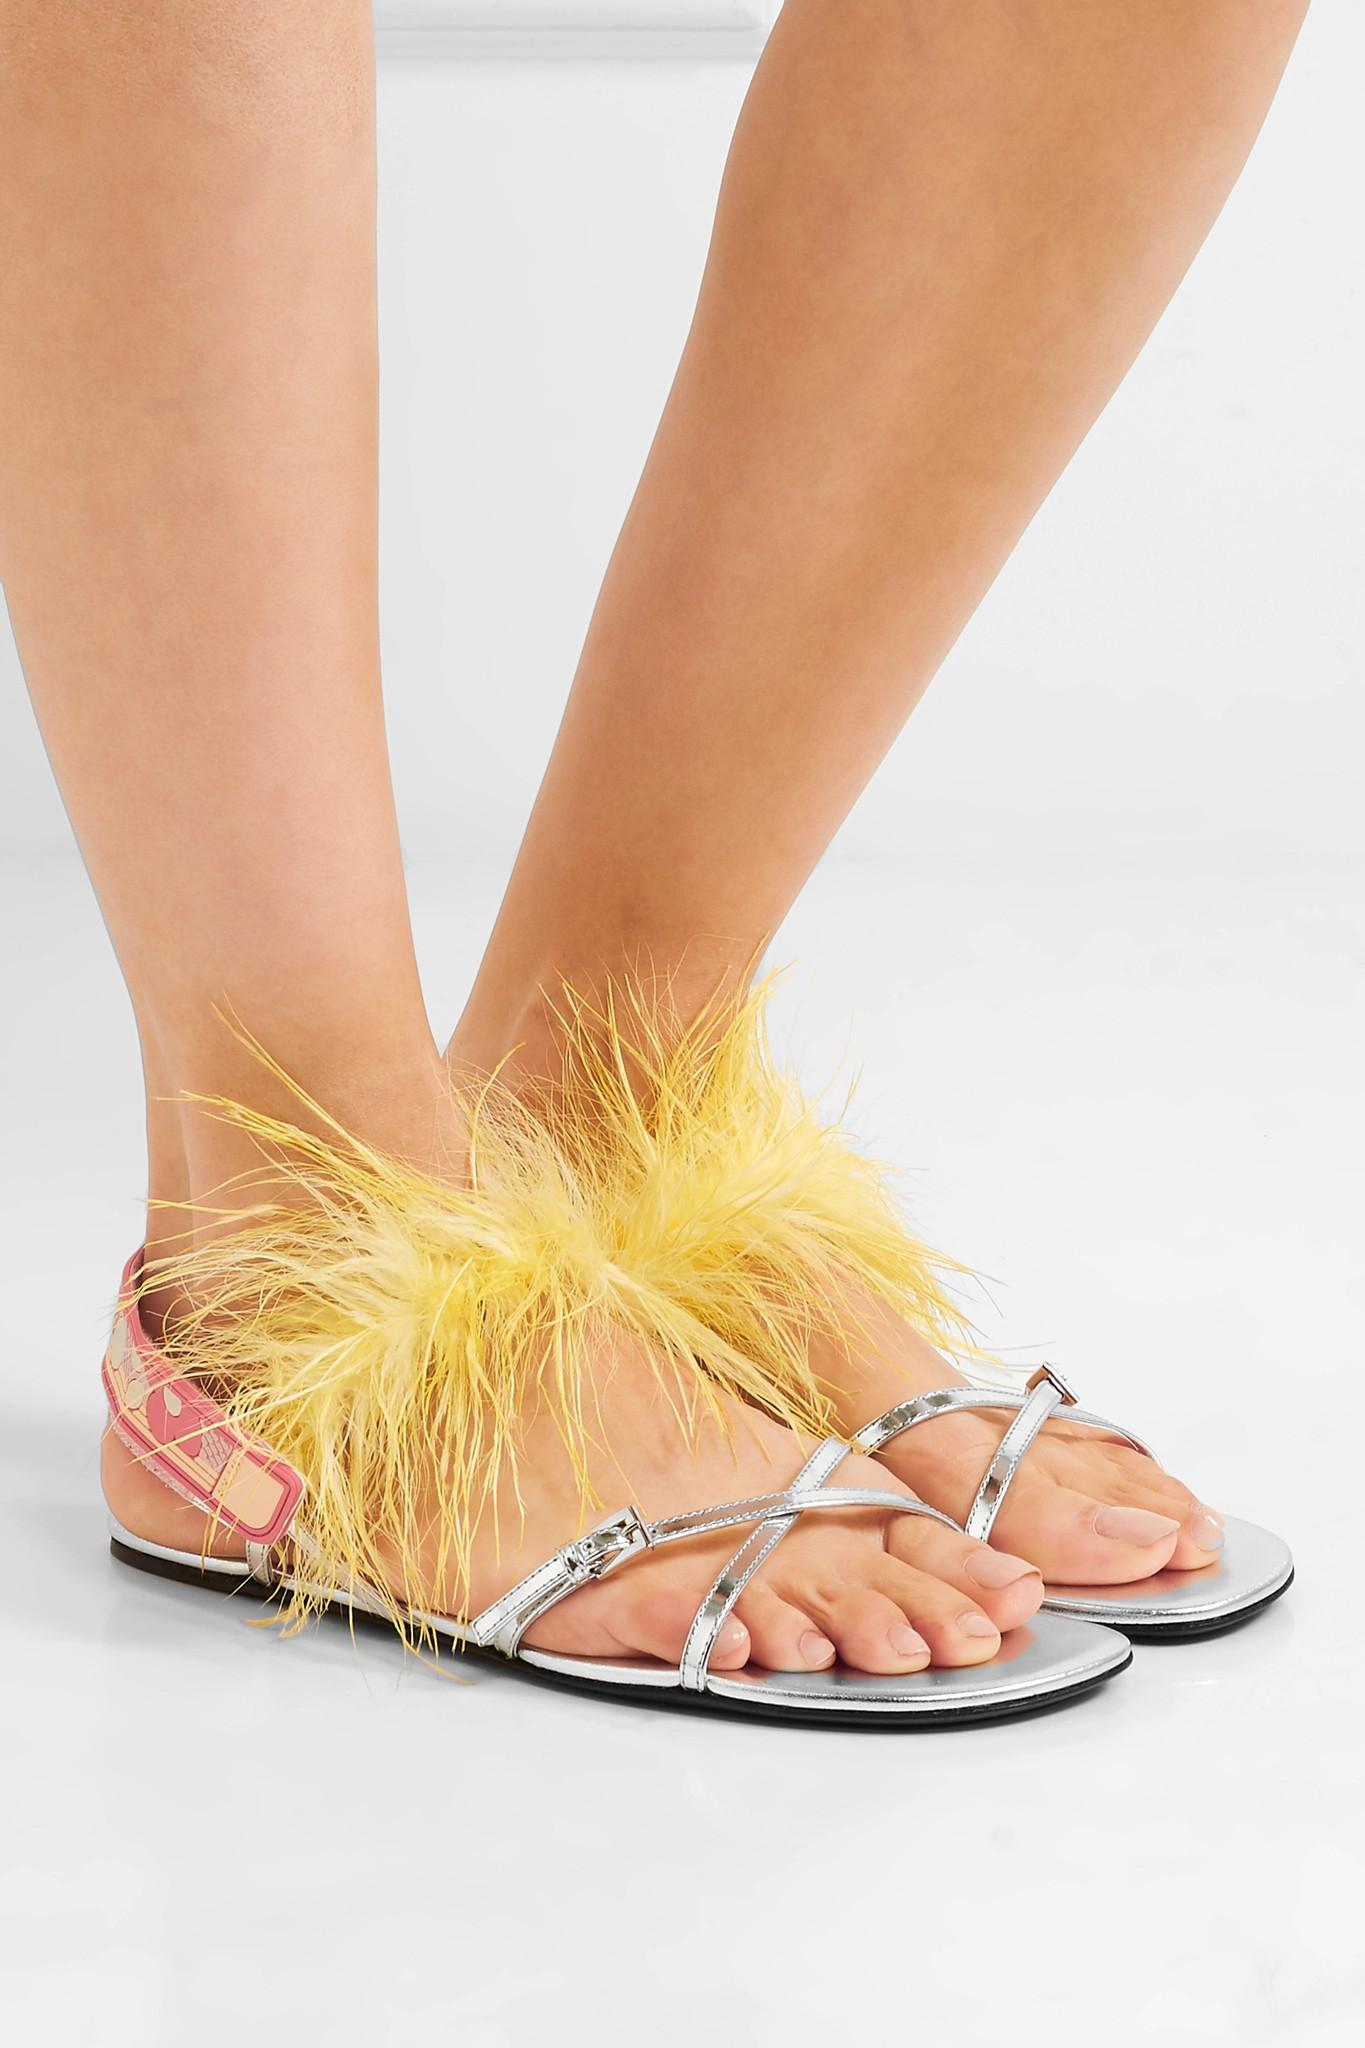 0b7b5b2b654 Prada - Feather-embellished Metallic Leather Sandal - Lyst. View fullscreen